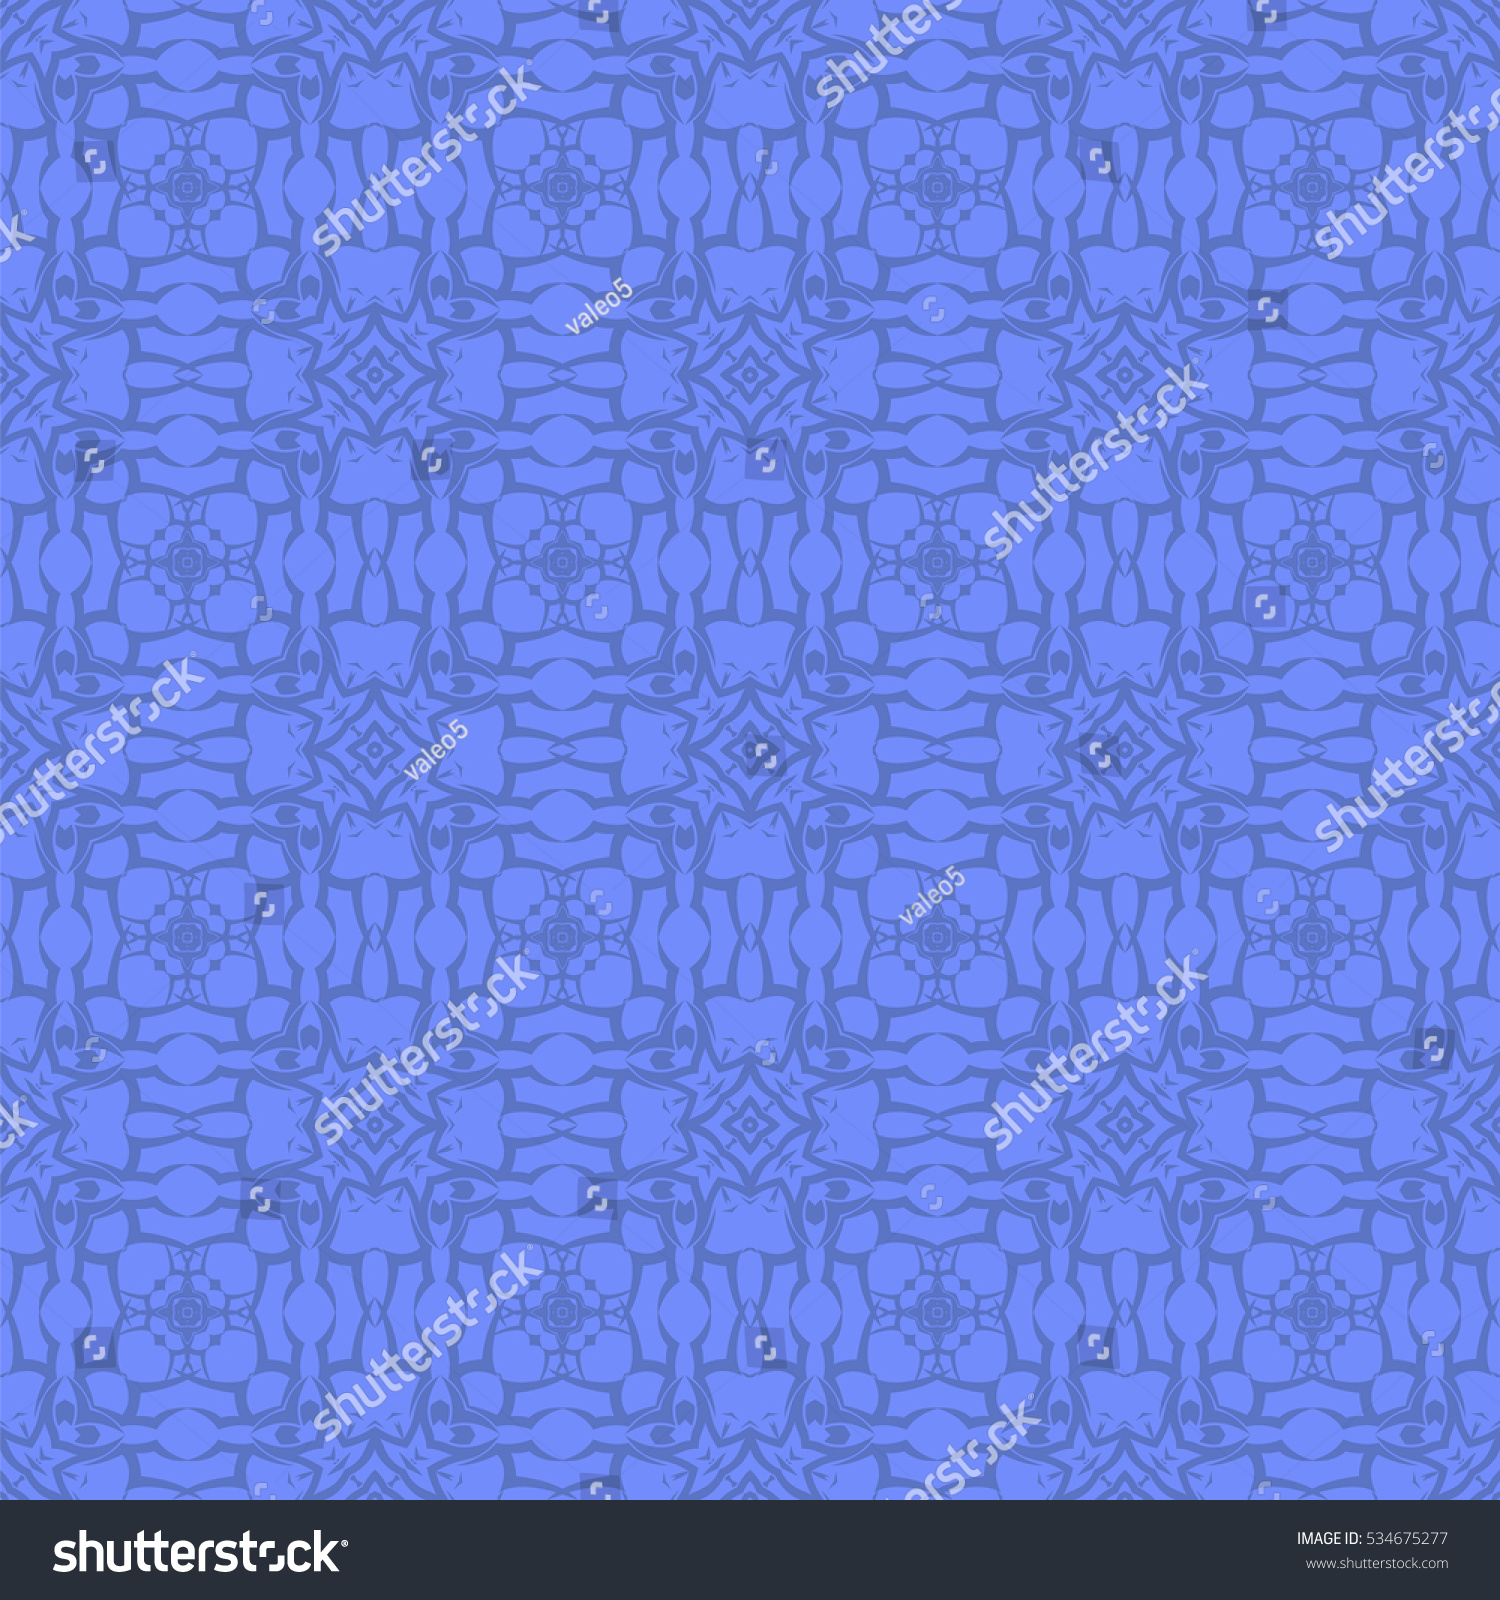 Line Texture Seamless : Vector blue ornamental seamless line pattern stock